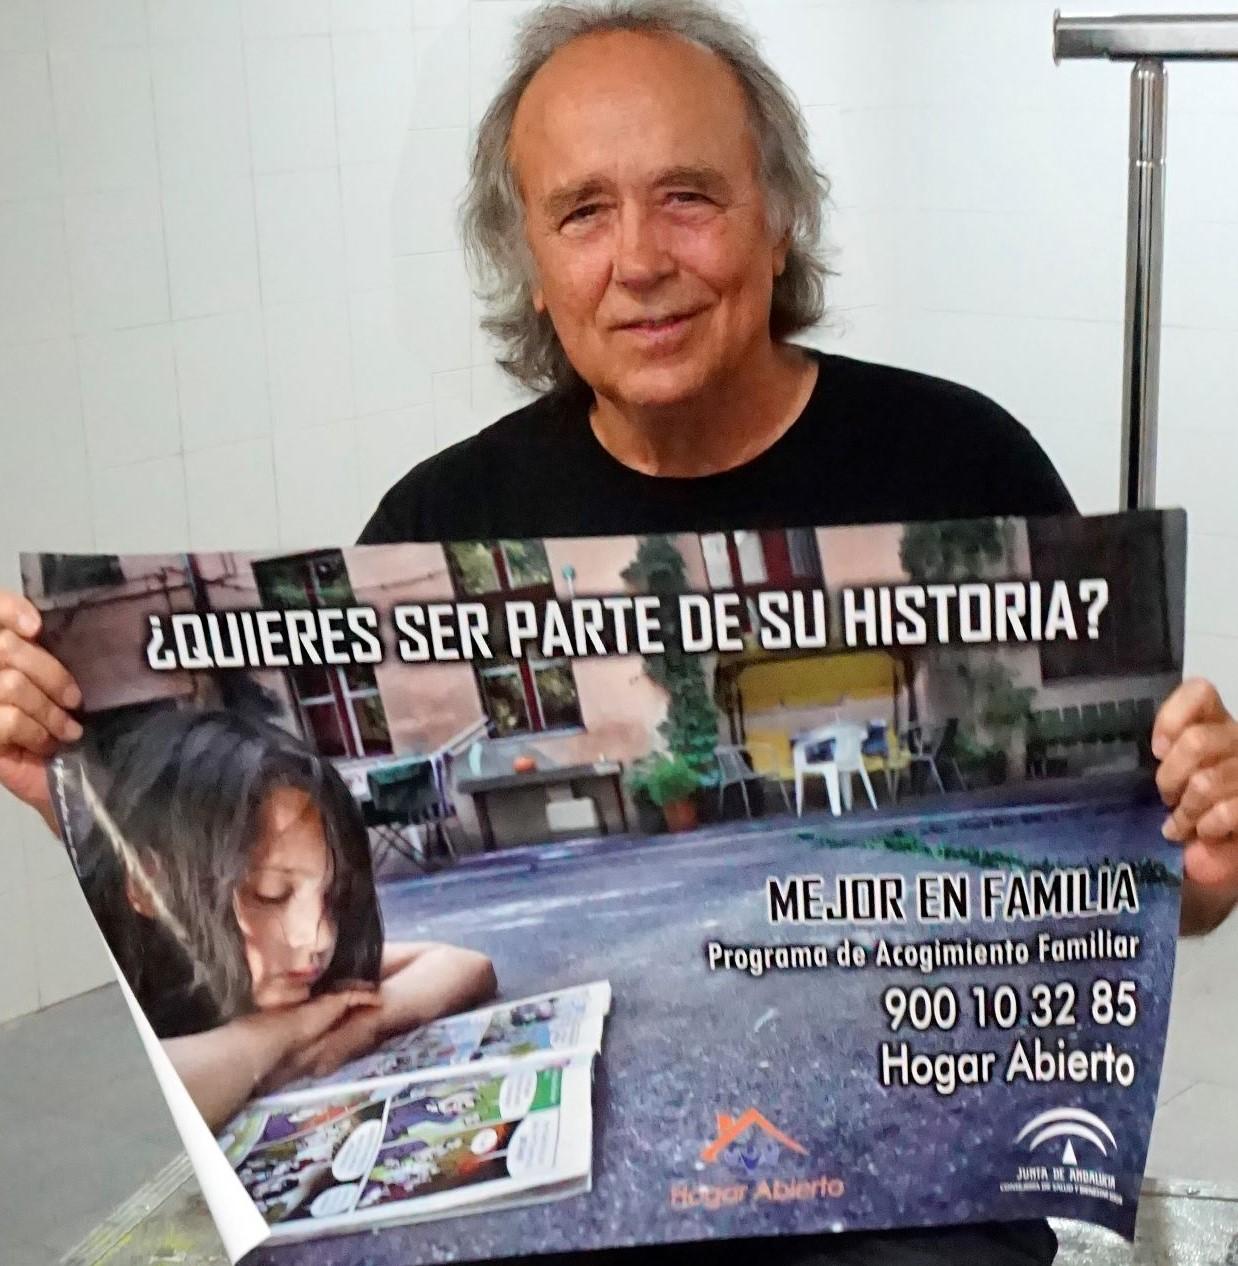 Joan Manuel Serrat apoya a Hogar Abierto